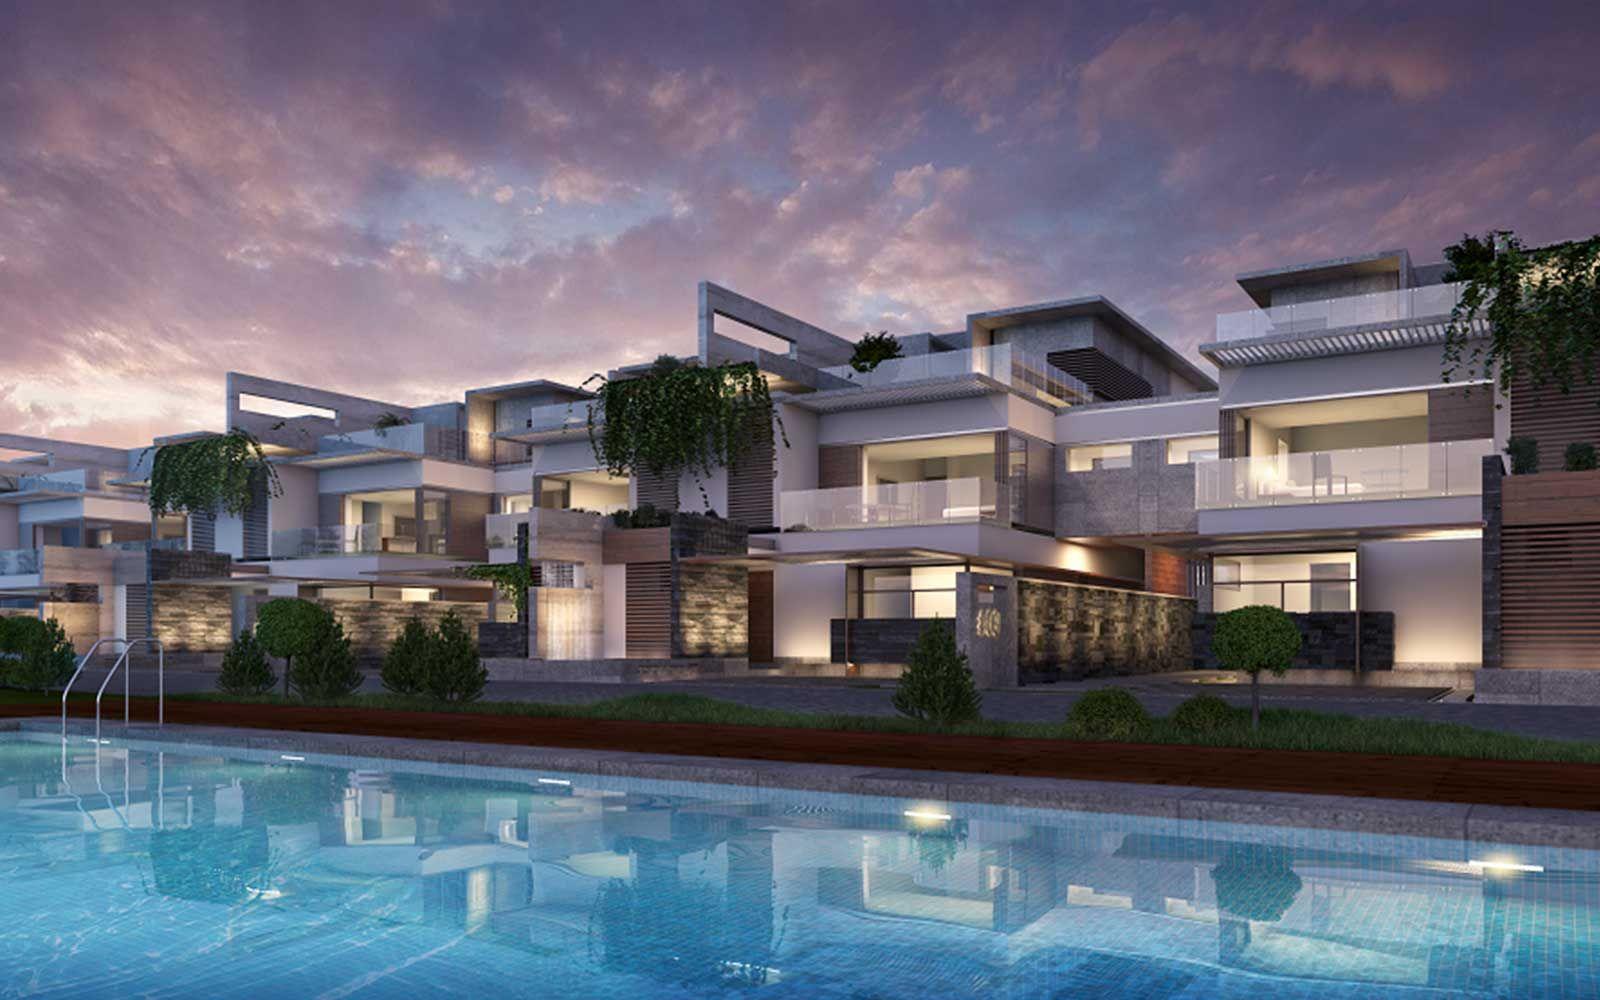 Villas in Sarjapur Road Bangalore for Sale: Vaswani Group Is Offering Luxury 3 BHK and 4 BHK Villas For Sale In Sarjapur Road Bangalore- Walnut Creek.